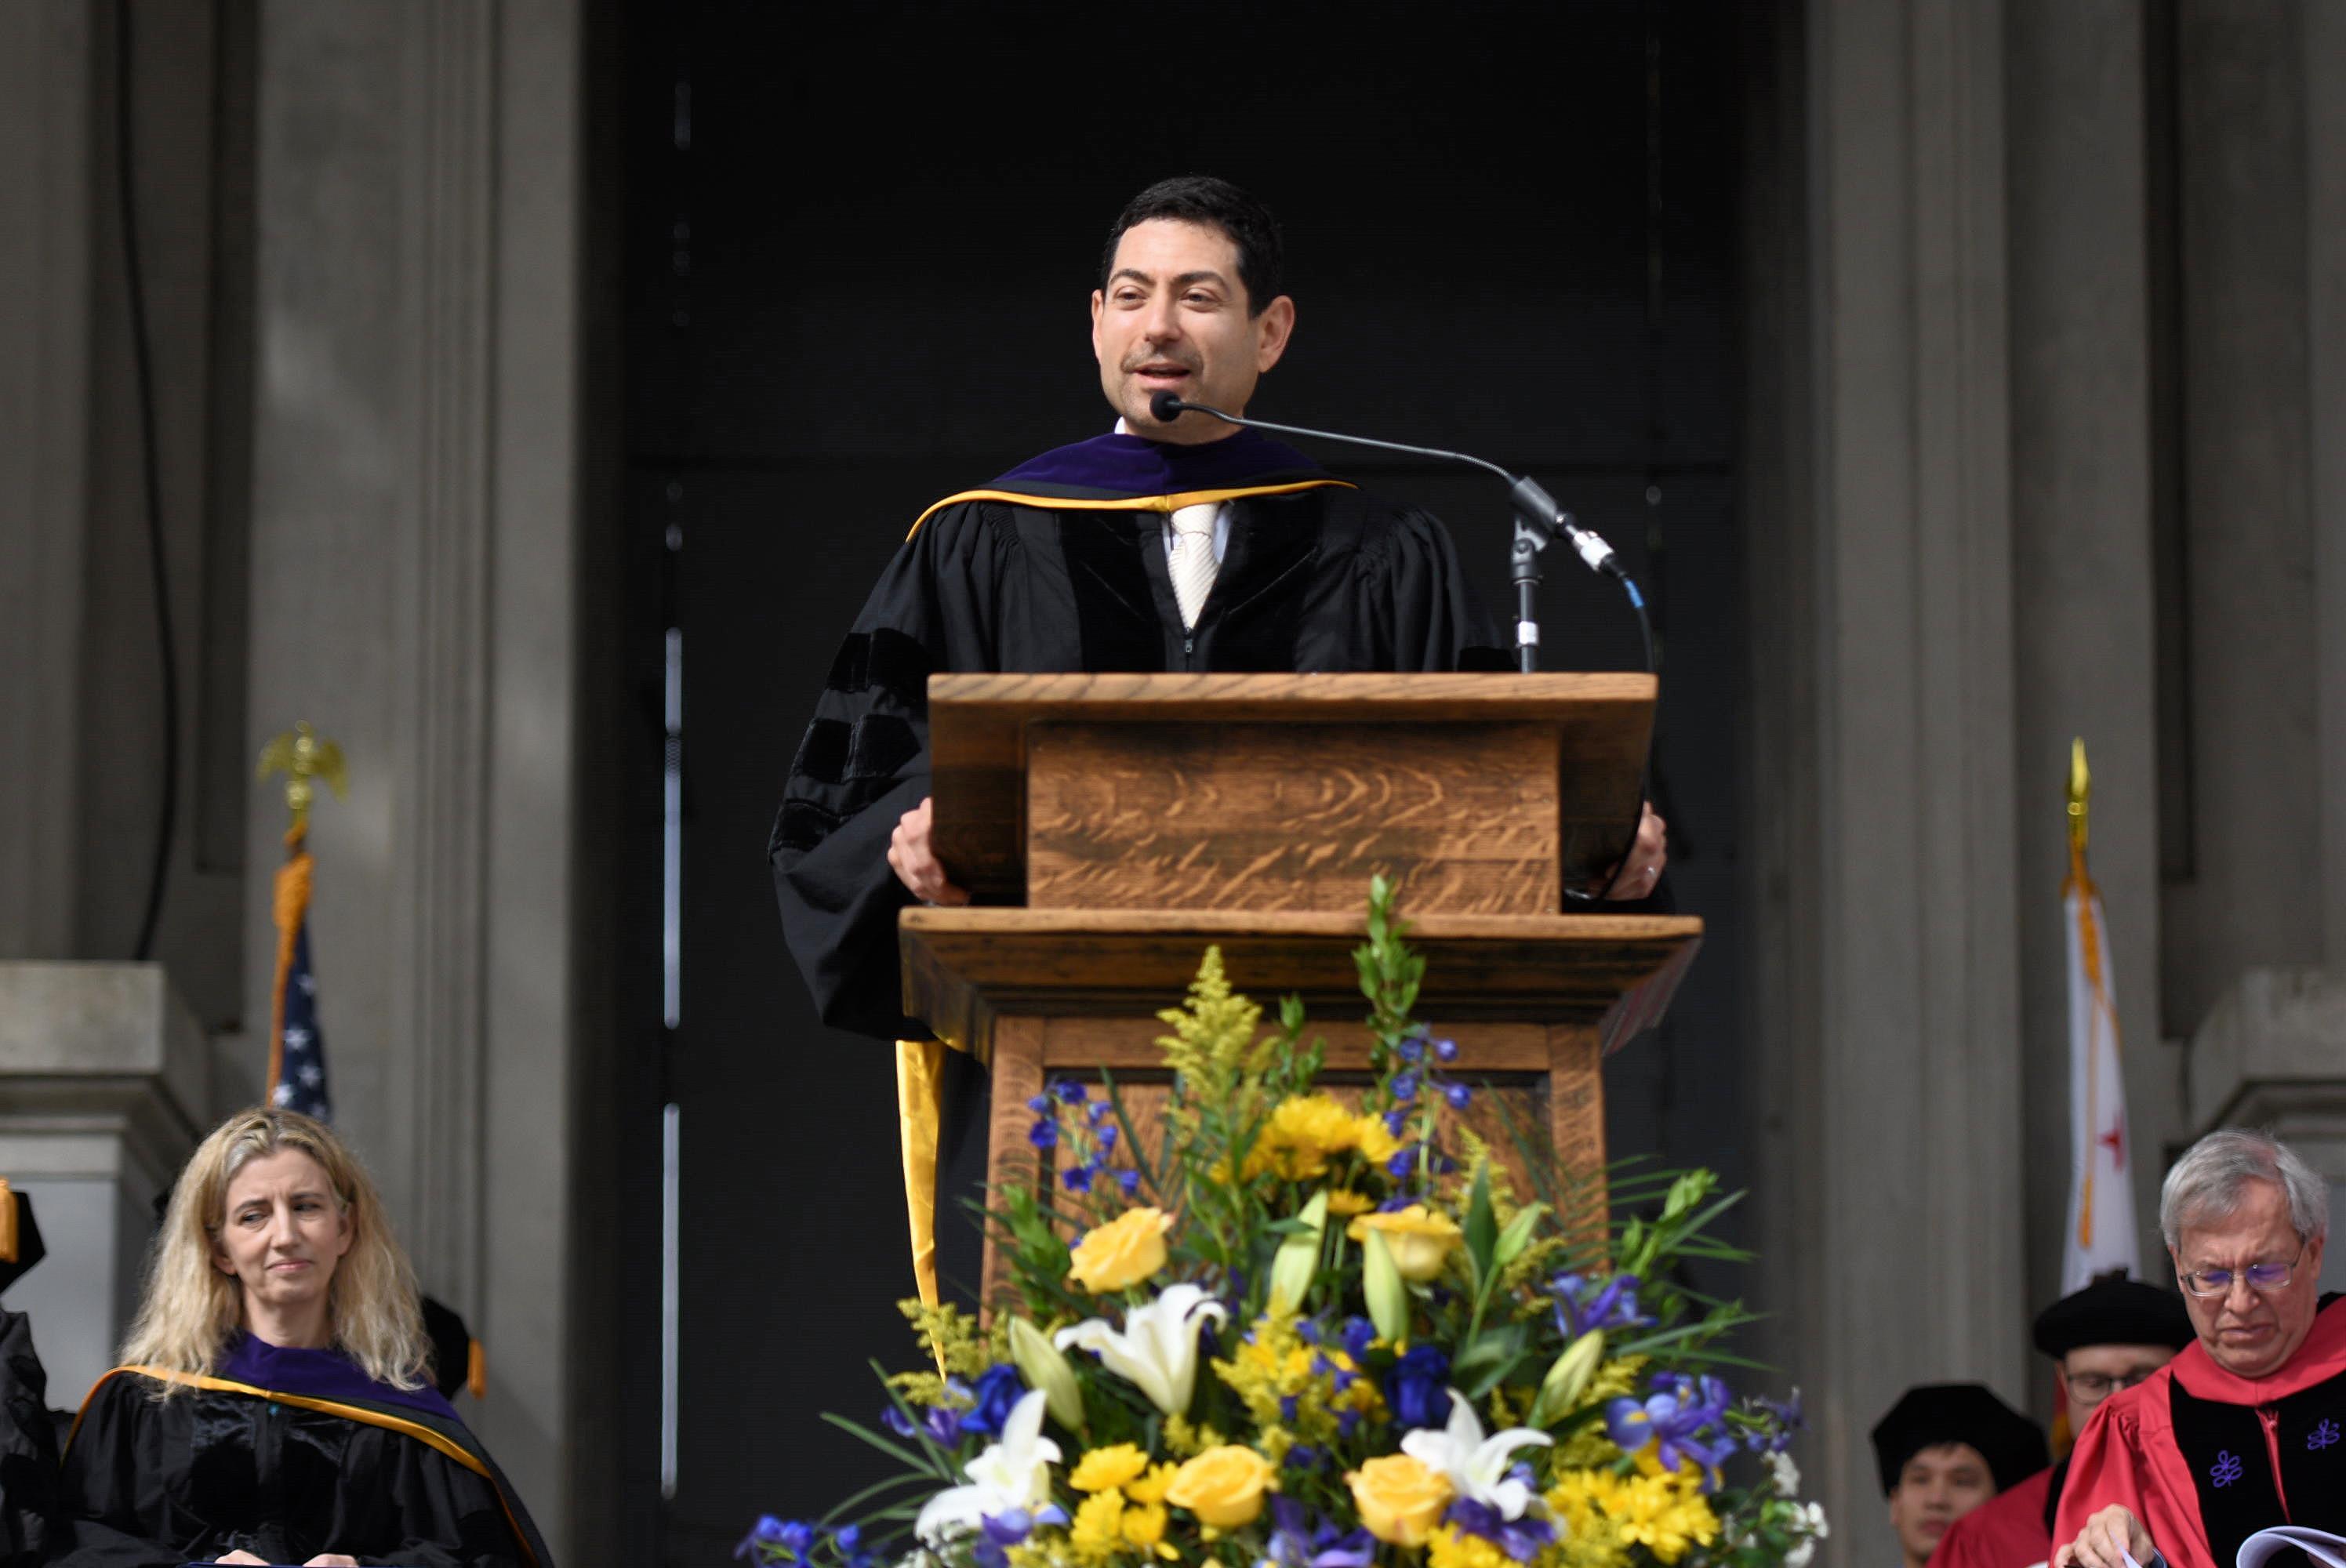 Cuellar UC Berkeley Commencement 1